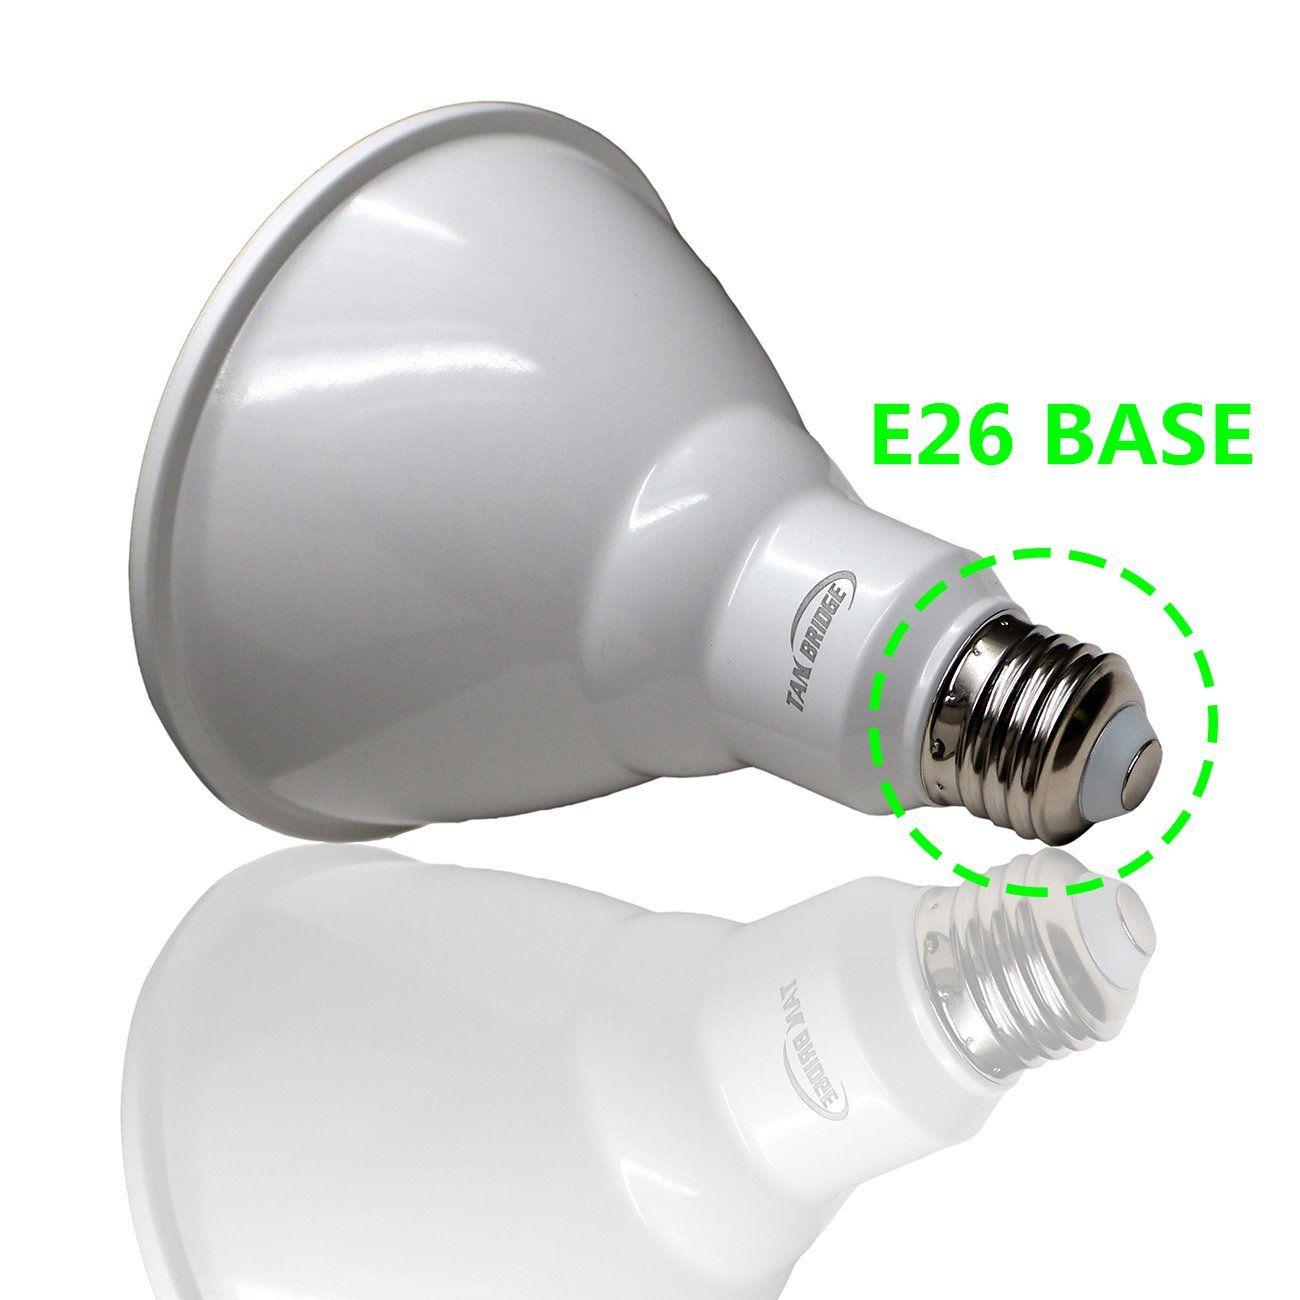 6 Pack Led Par38 Light Bulbs E26 Medium Screw Flood Light 5000k Crystal White Glow 120 Watt Equivalent18w Ac 120v 60hz Ul Listed In 2020 Flood Lights Light Bulbs Bulb